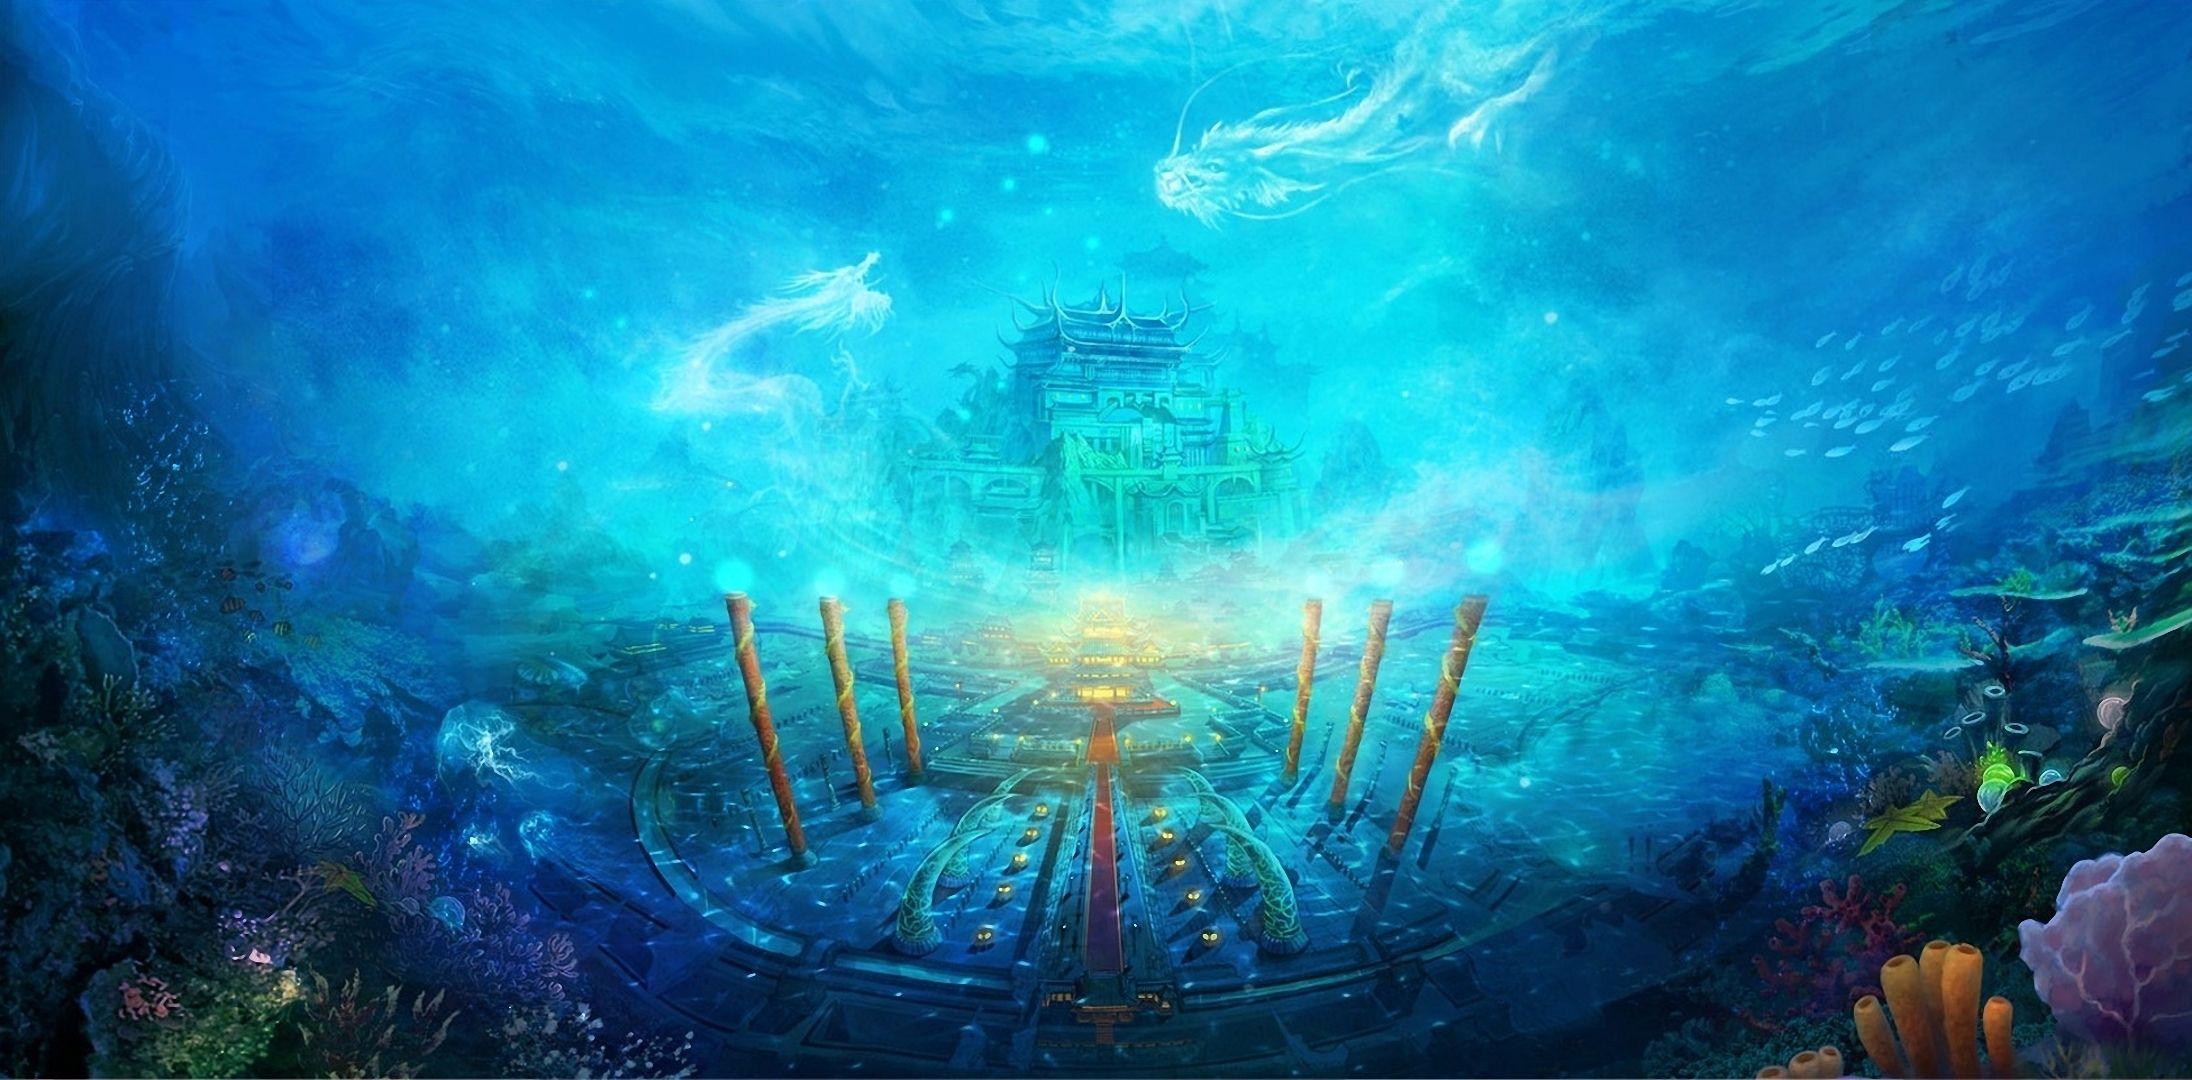 Images For Gt Underwater World Fantasy Fantasy Landscape Ocean Wallpaper Underwater City